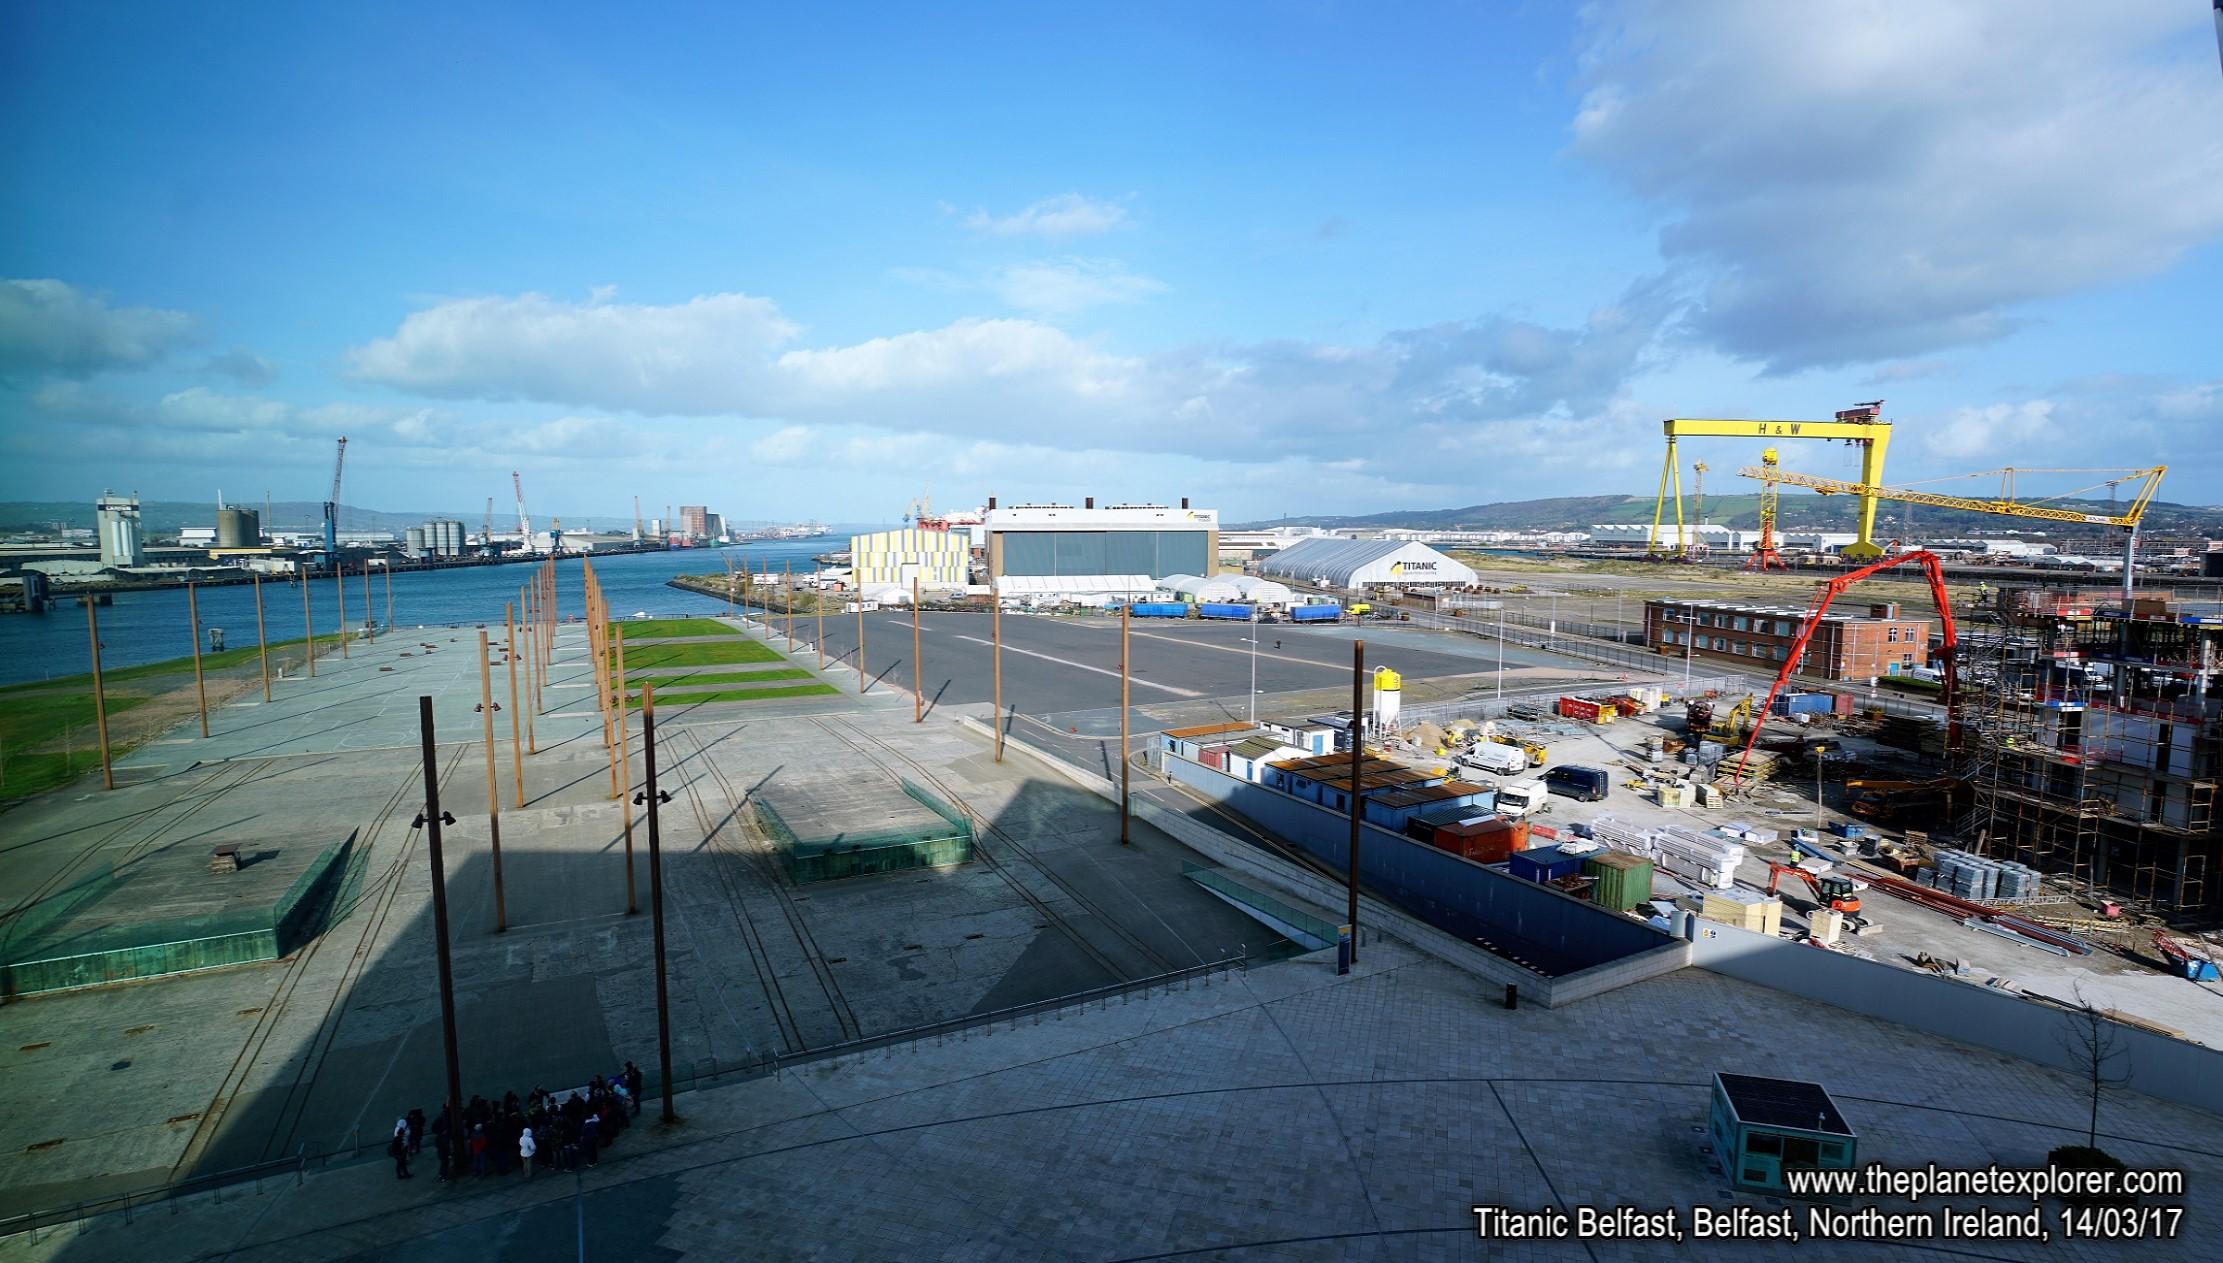 2017-03-14_1510_Northern Ireland_Belfast_Titanic Belfast_DSC08748_s7R2_LR_@www